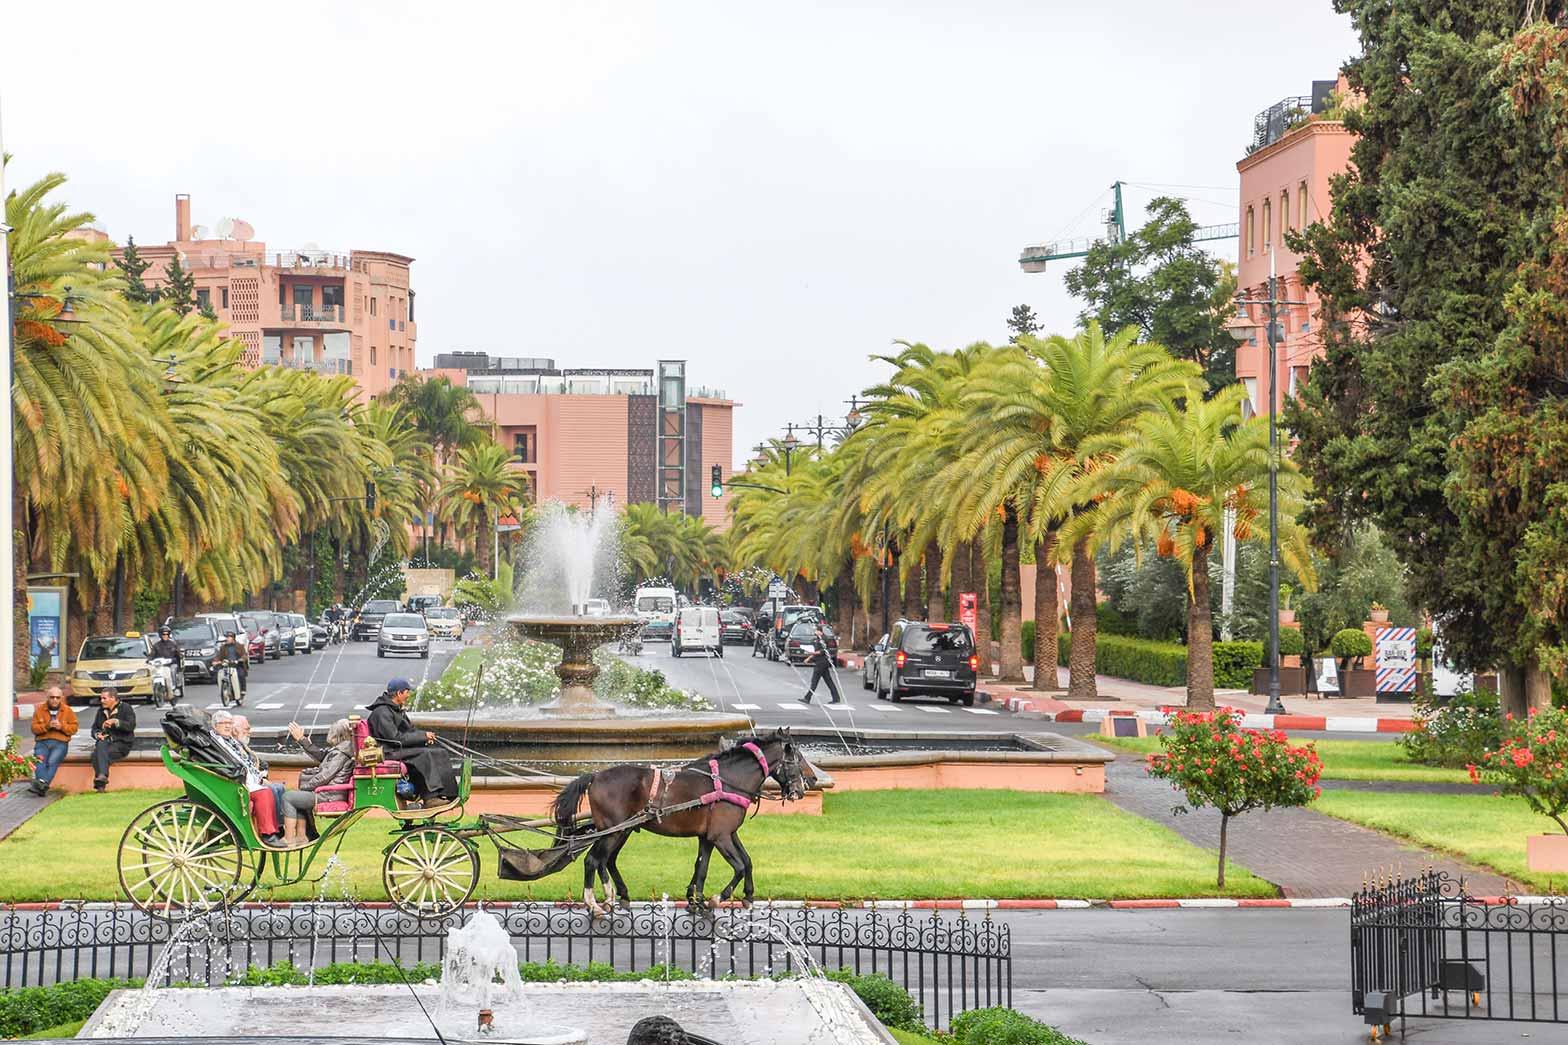 Local horse power, Marrakesh